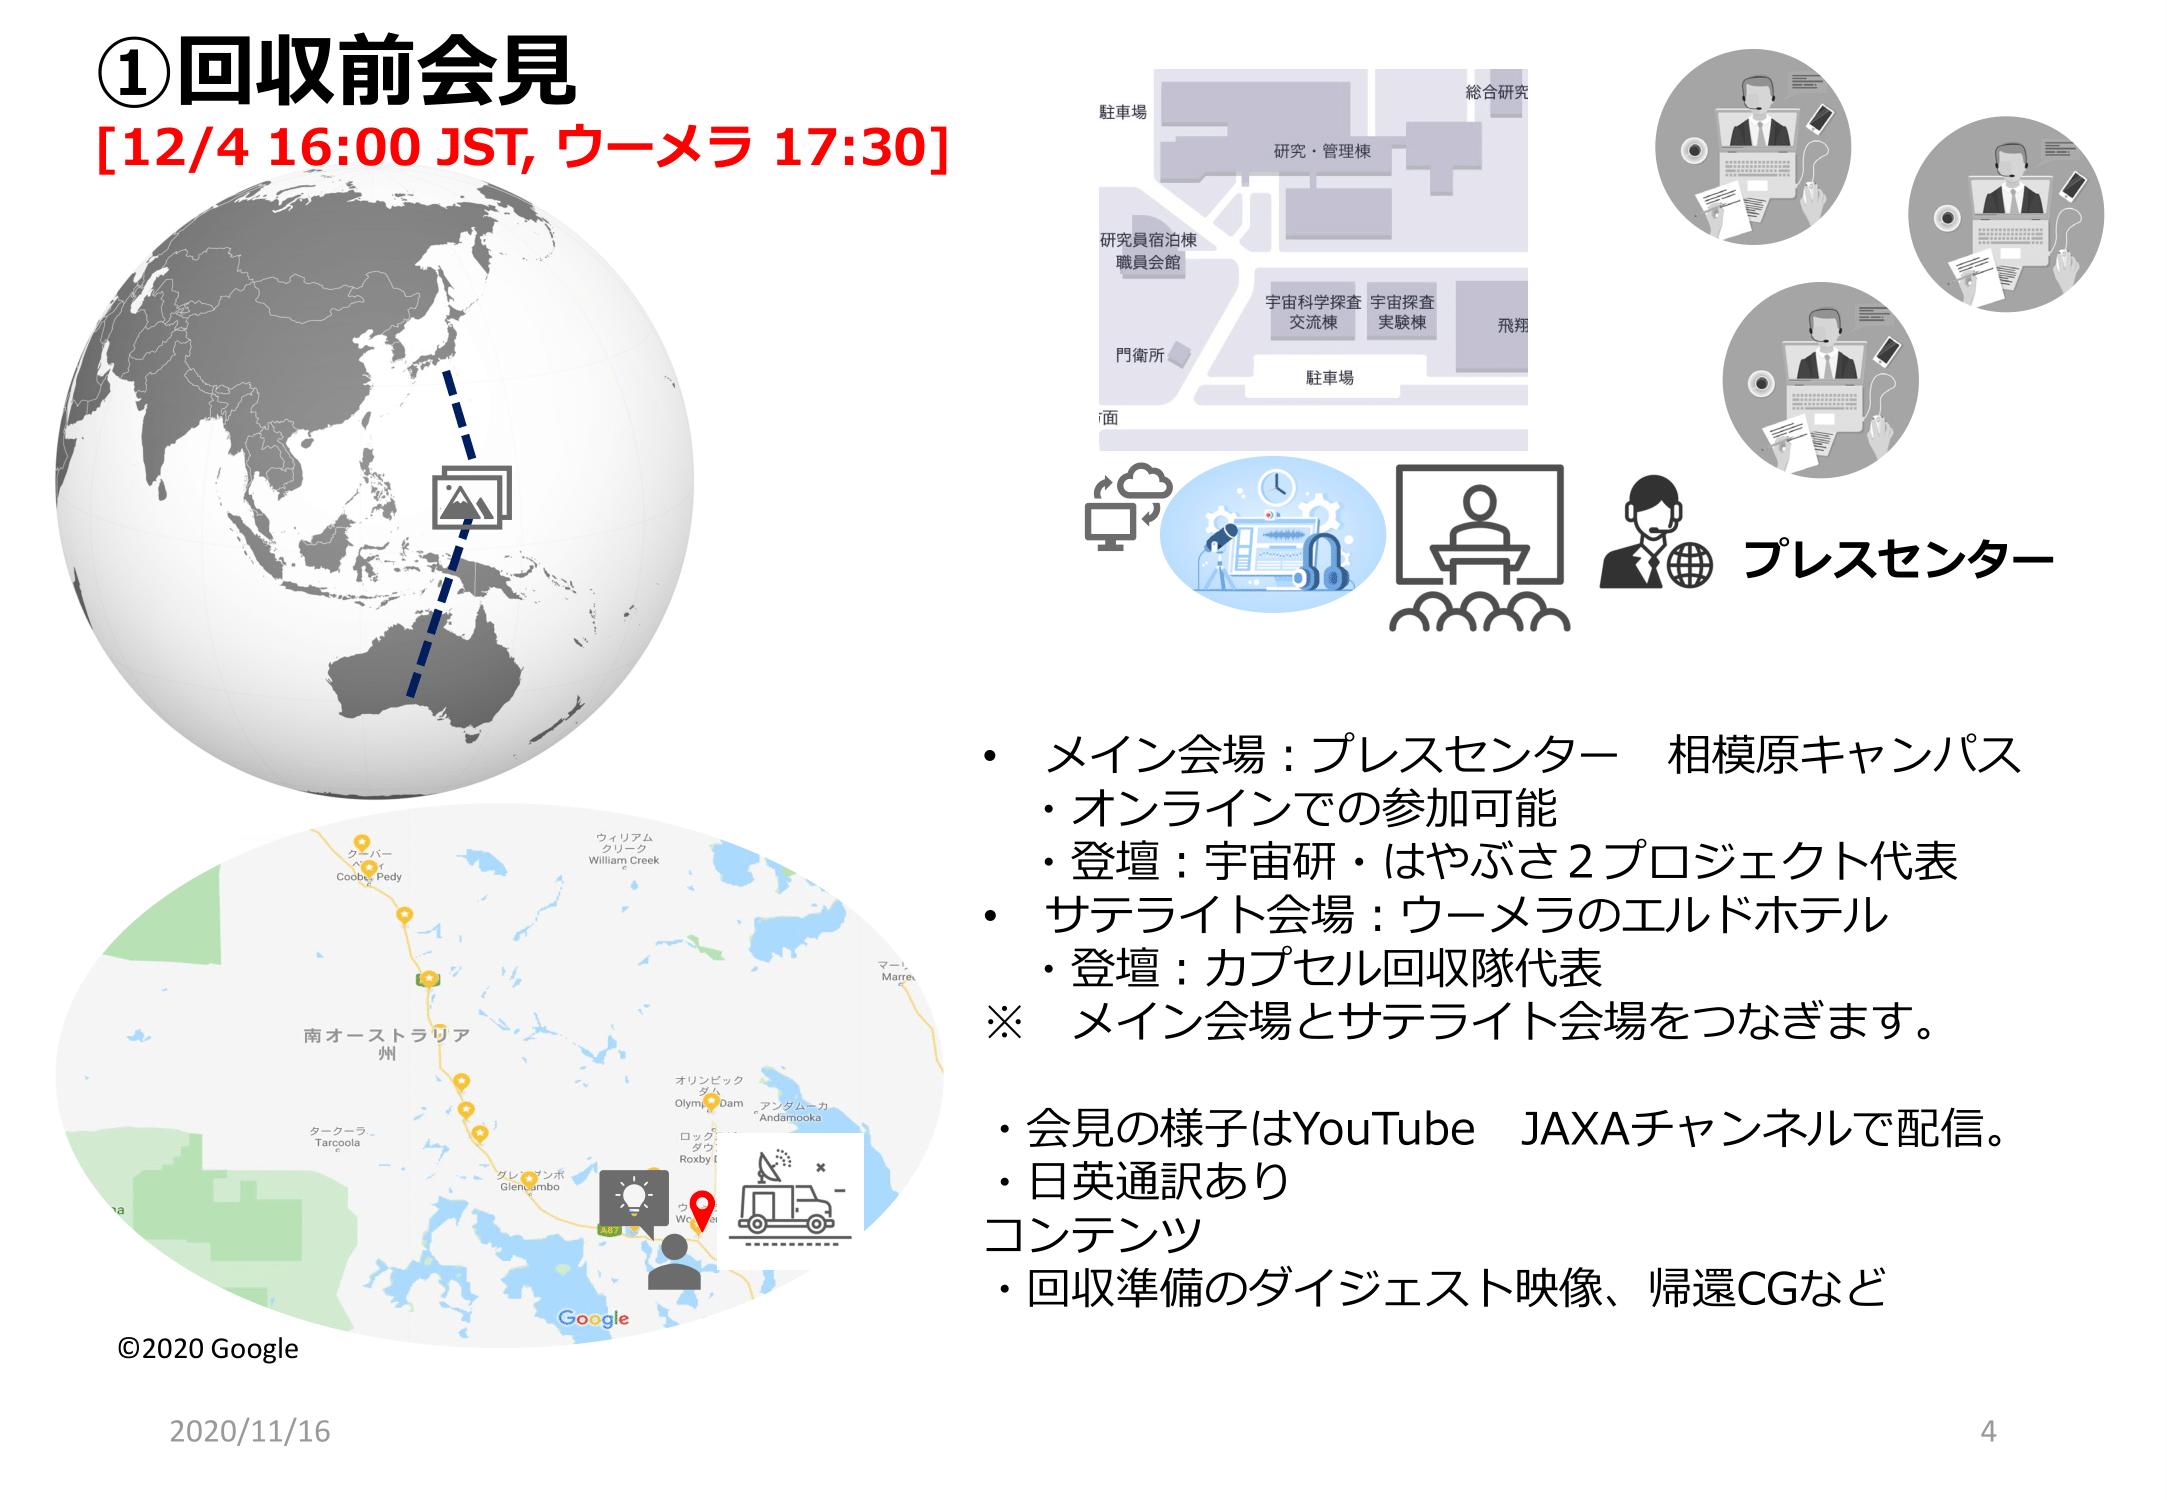 f:id:Imamura:20201117222205p:plain